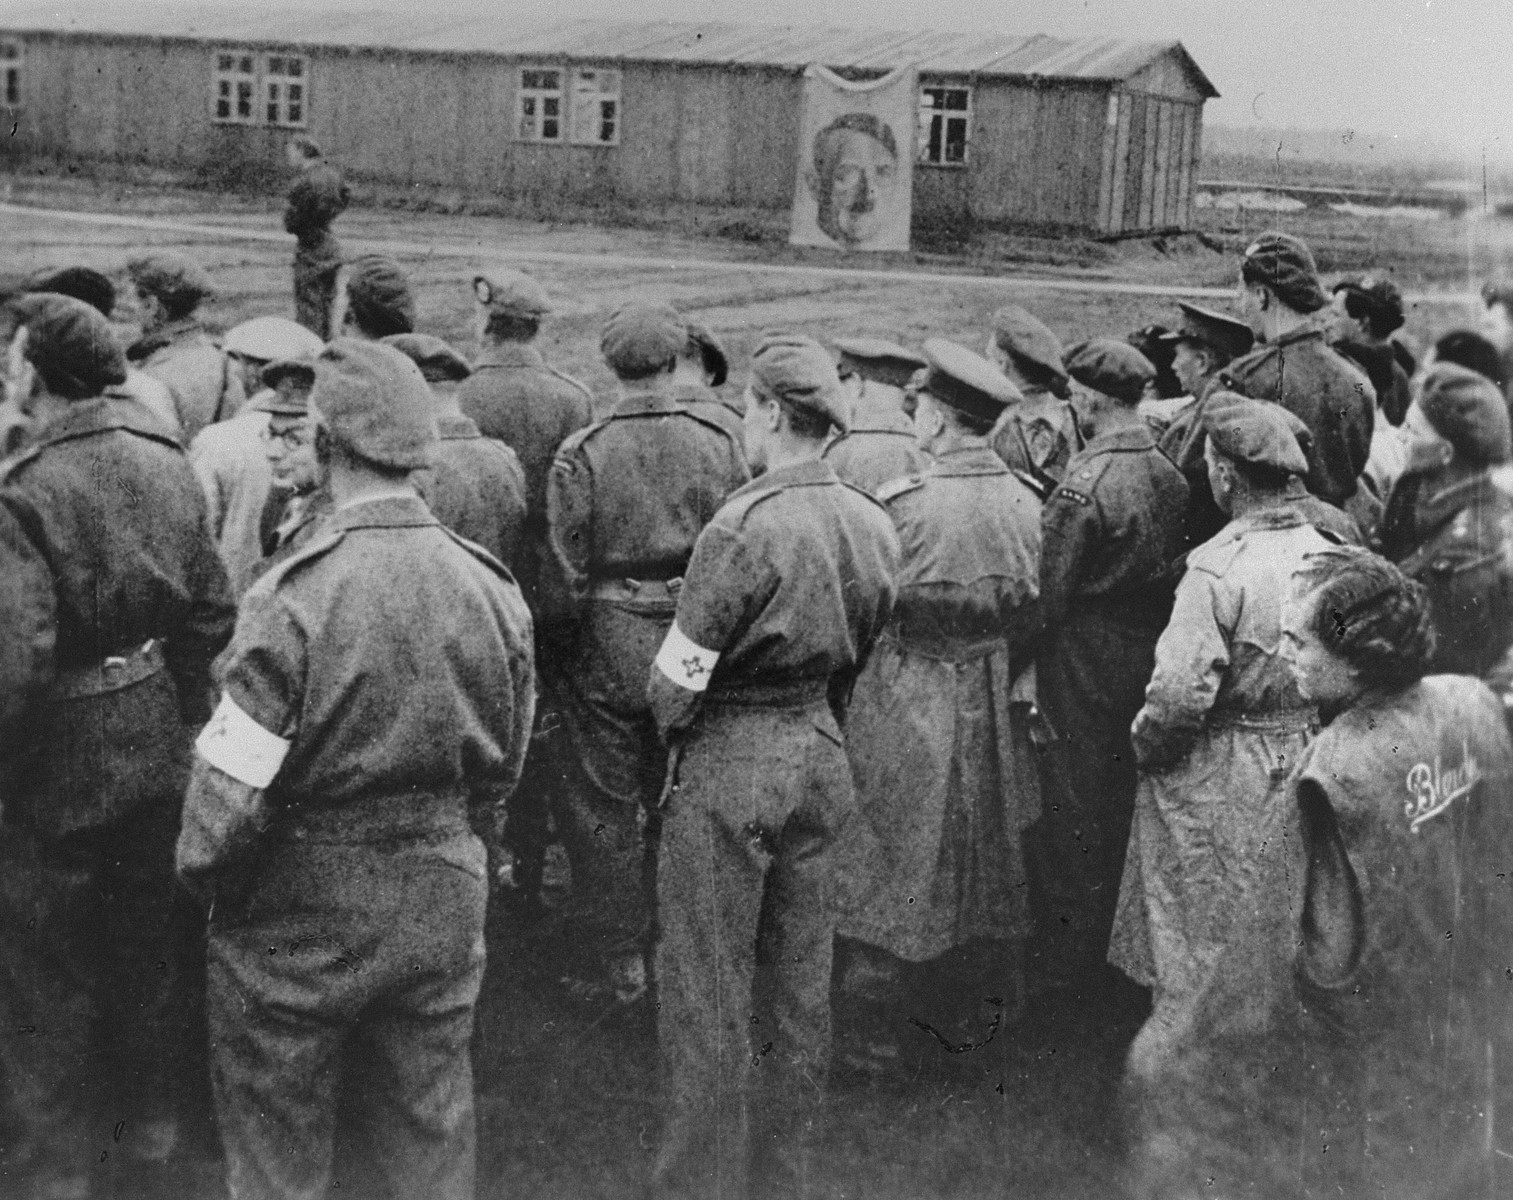 British troops look on as the last Typhus ridden barracks in Belsen are burned.